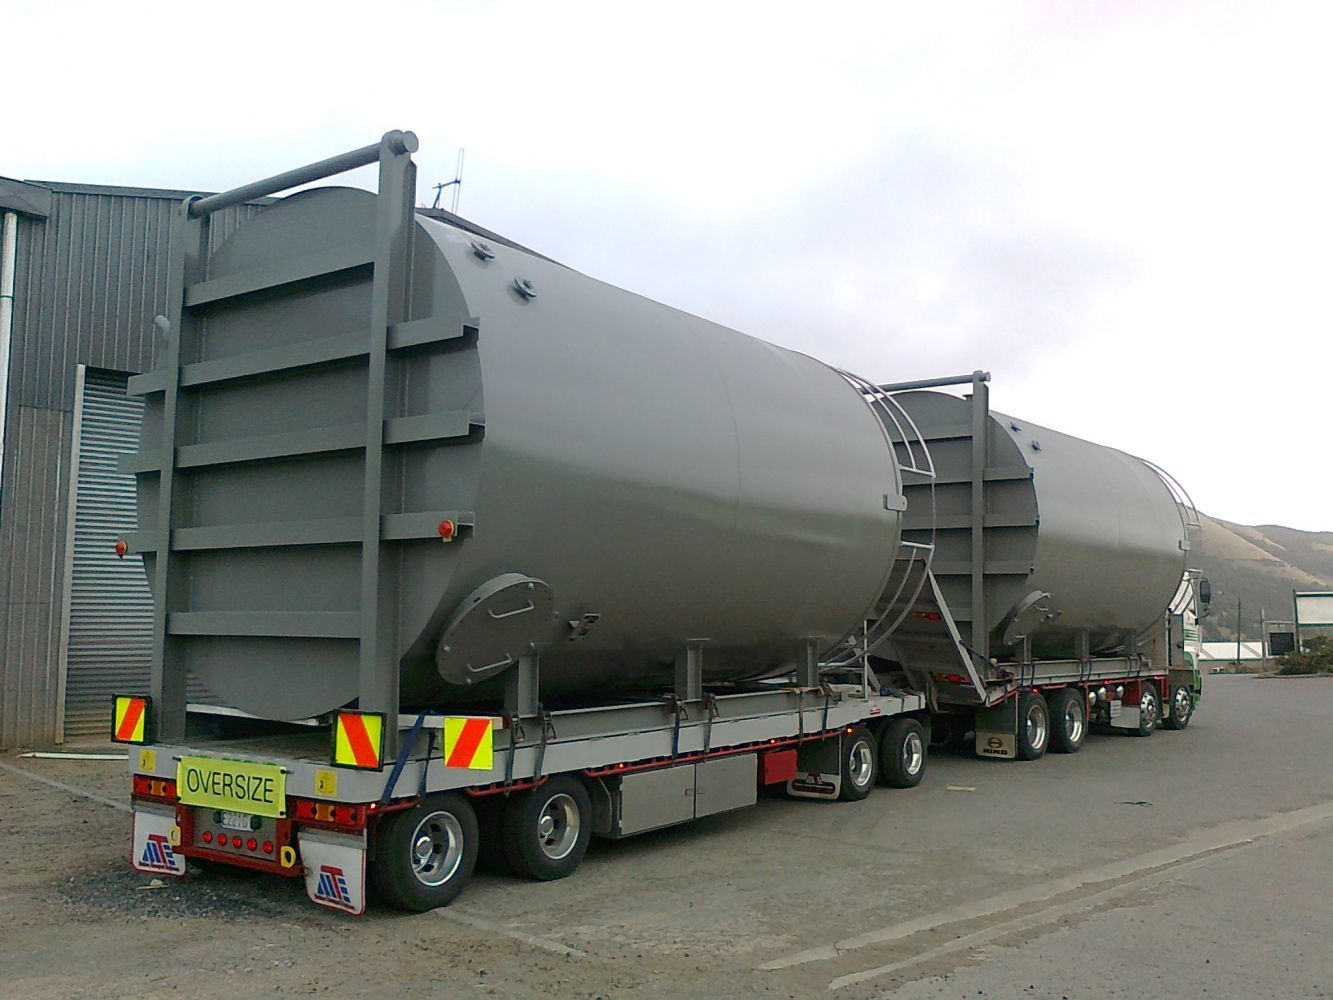 Industrial tanker